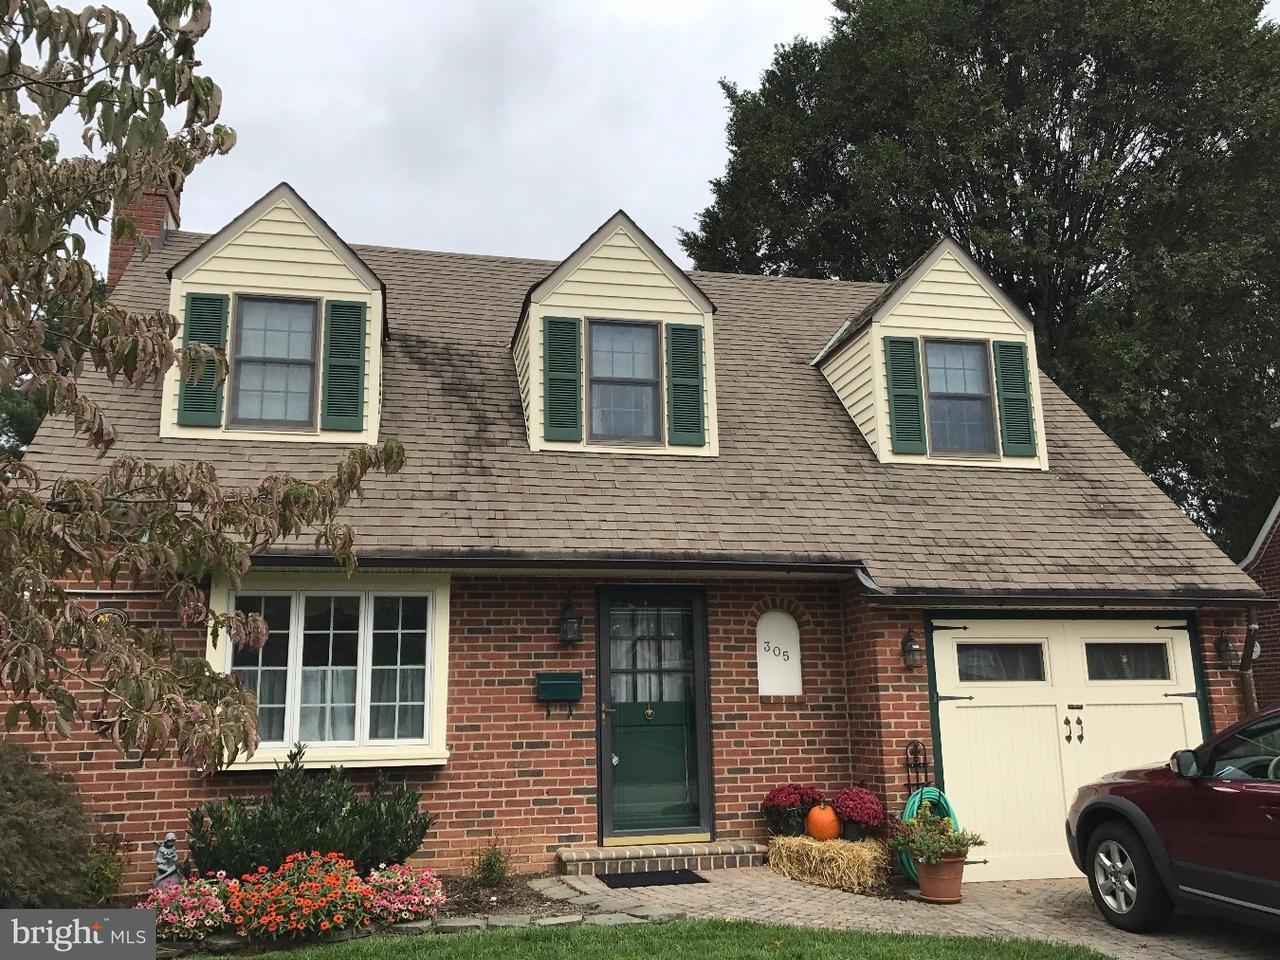 Single Family Home for Sale at 305 BURTON Road Oreland, Pennsylvania 19075 United States